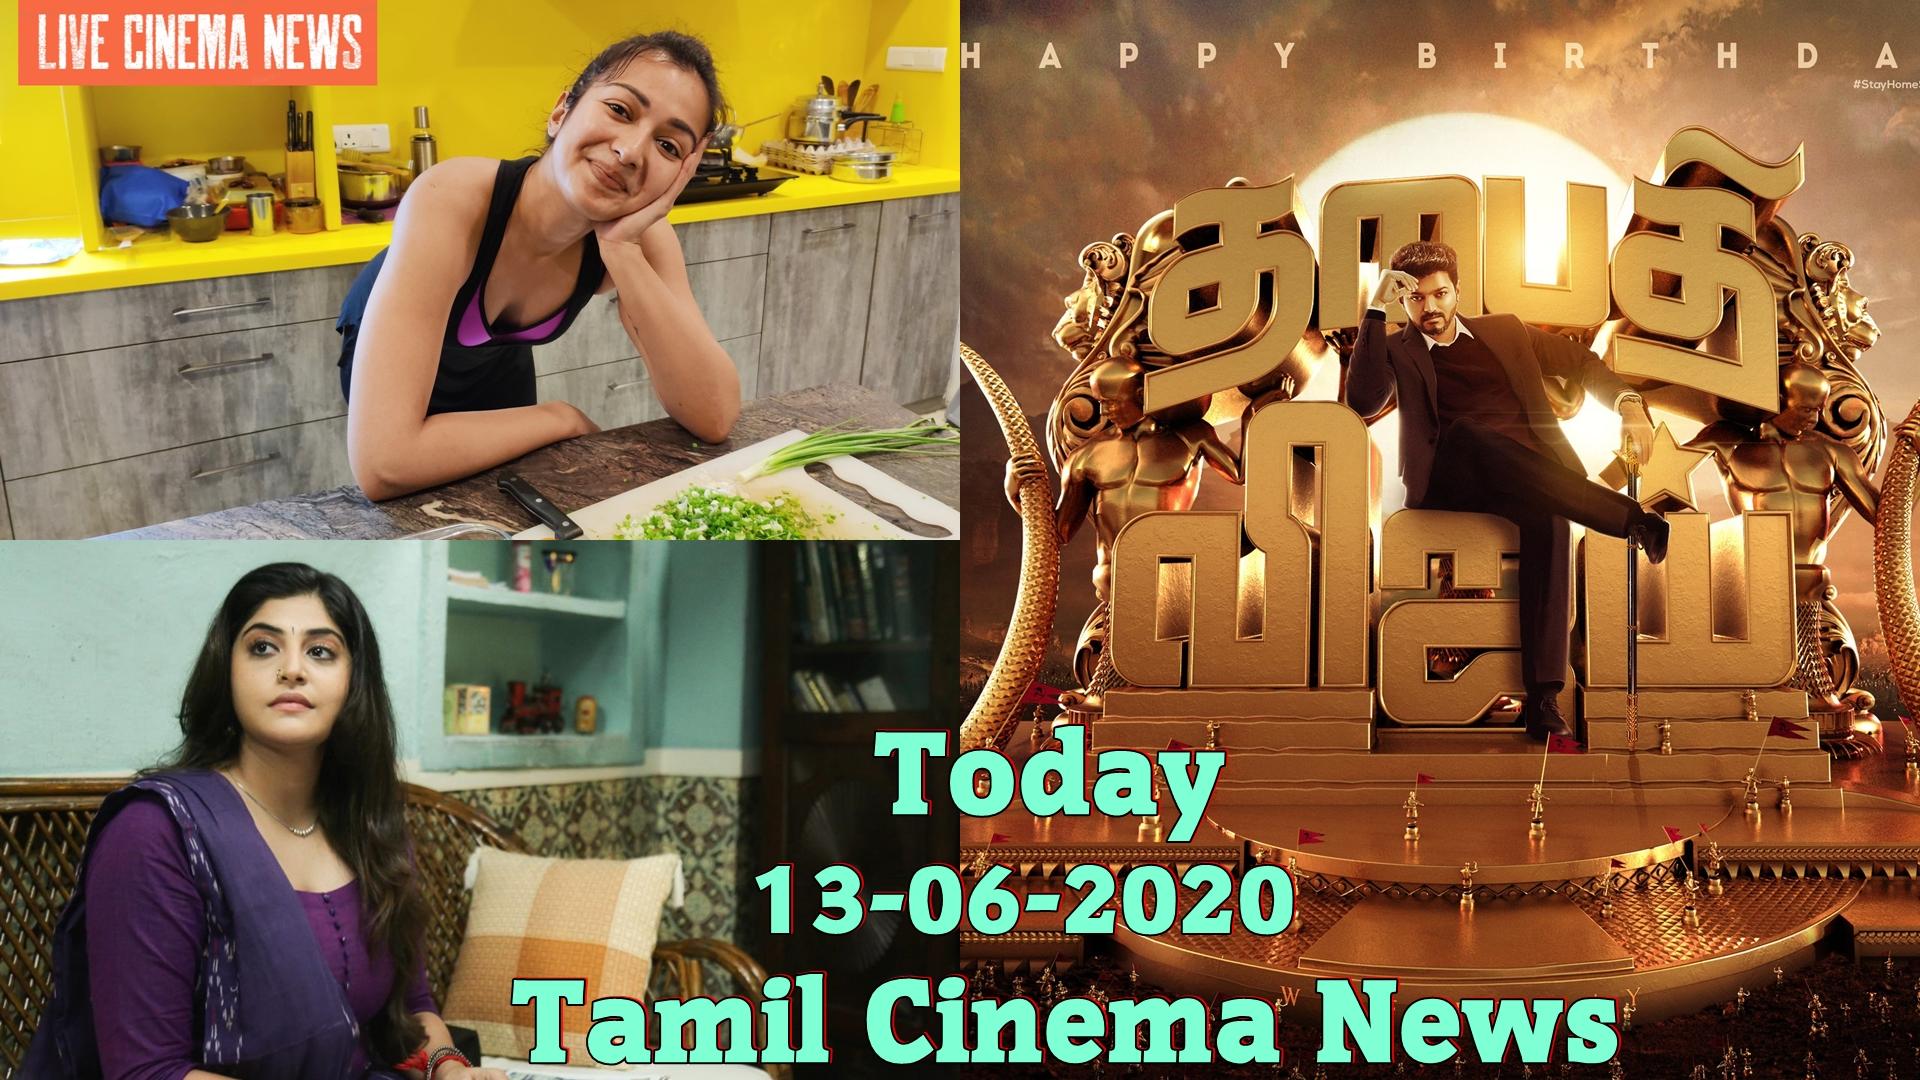 Today Tamil Cinema News 13-06-2020